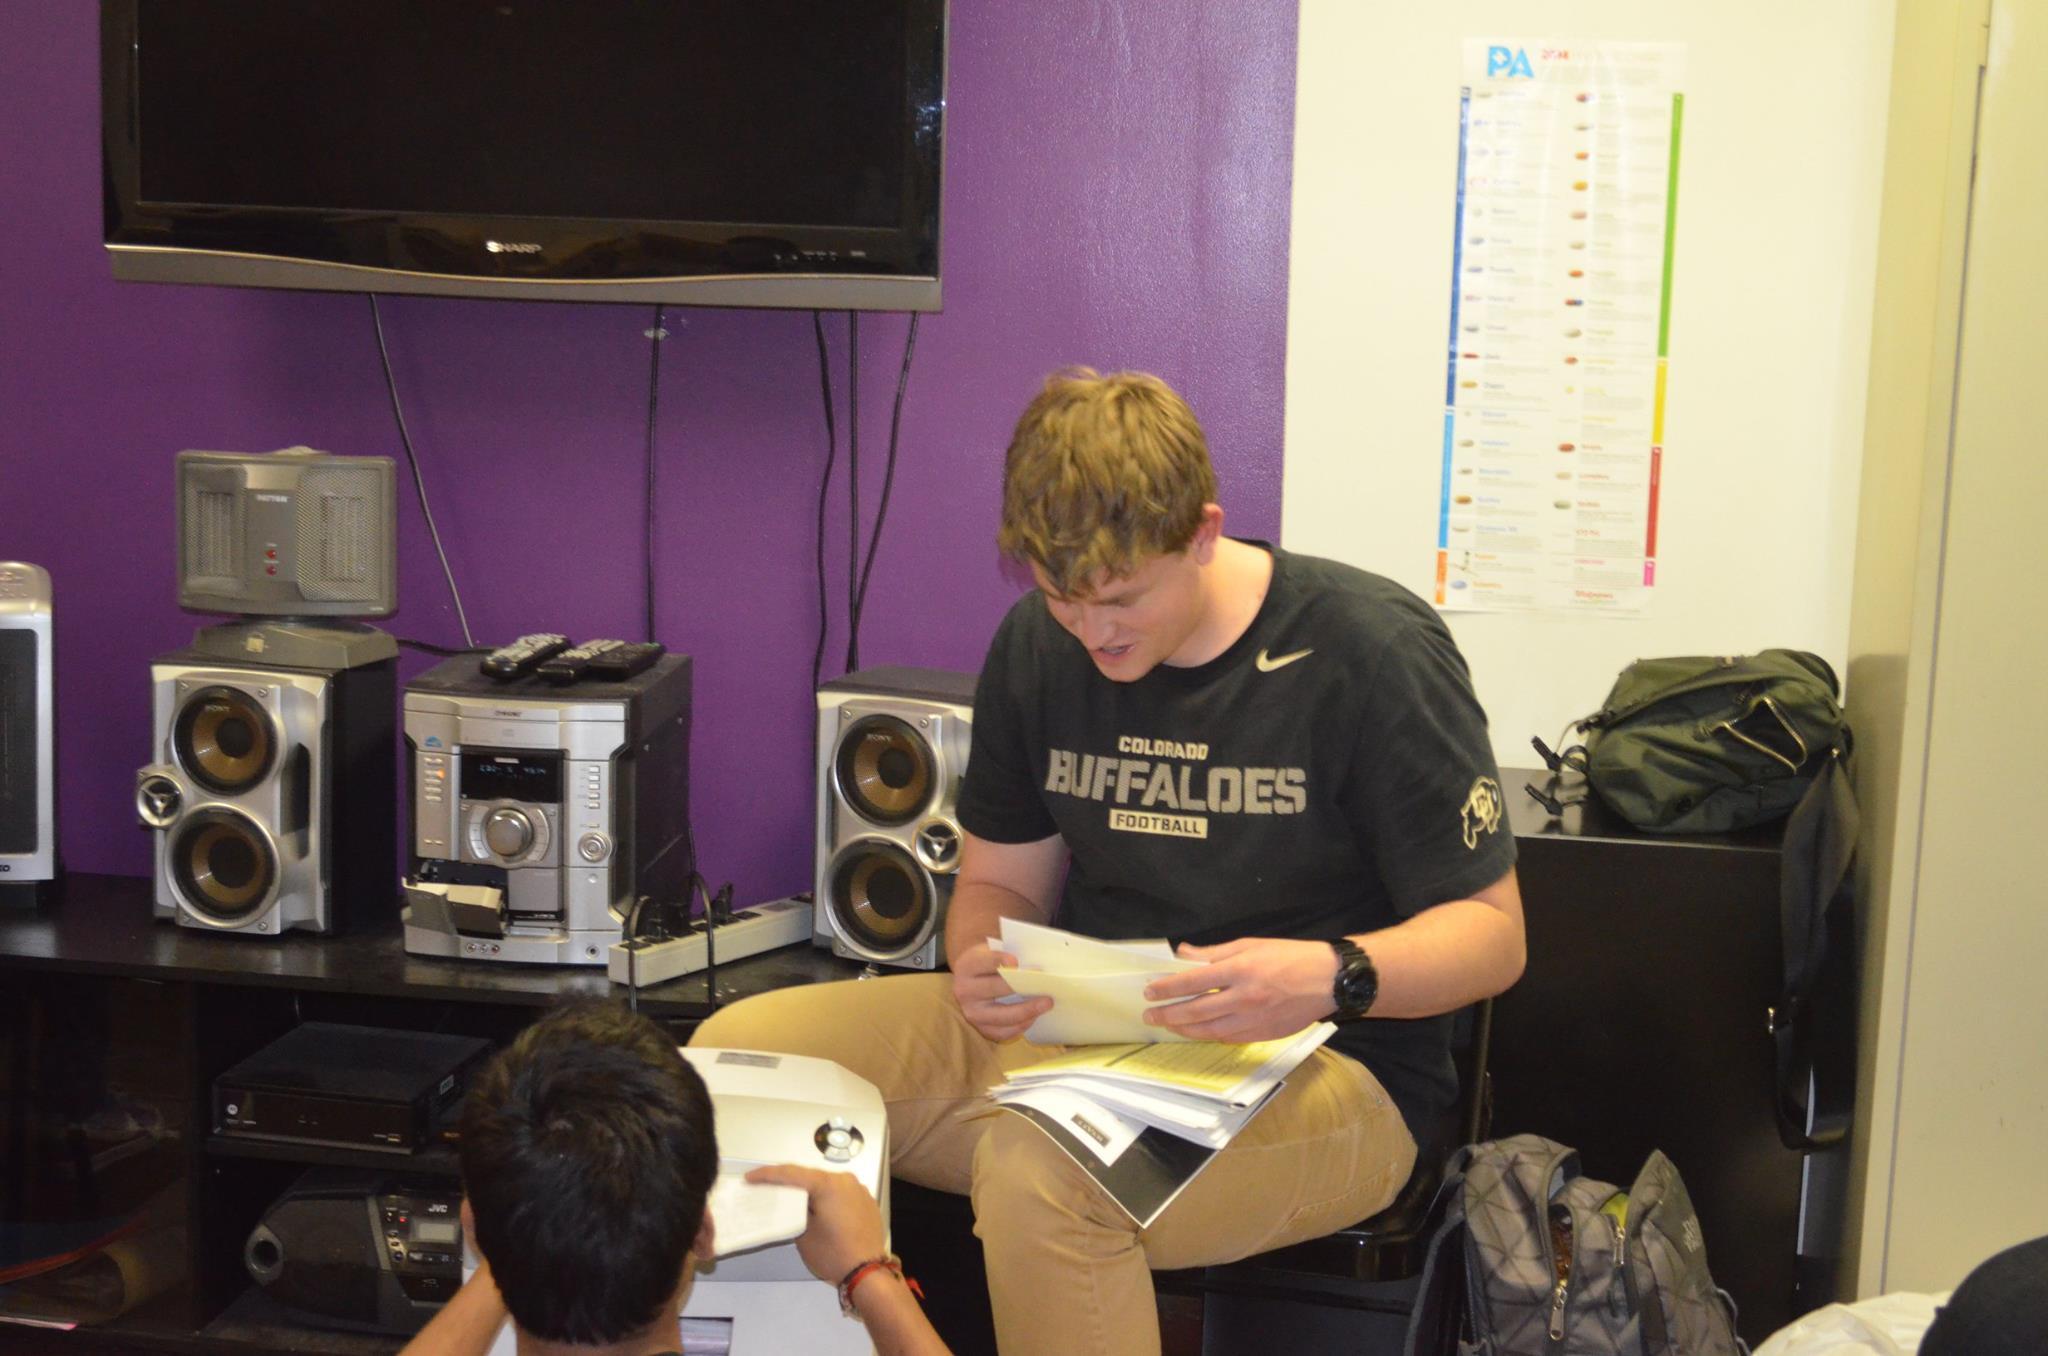 University of Colorado, Denver Students Working Hard